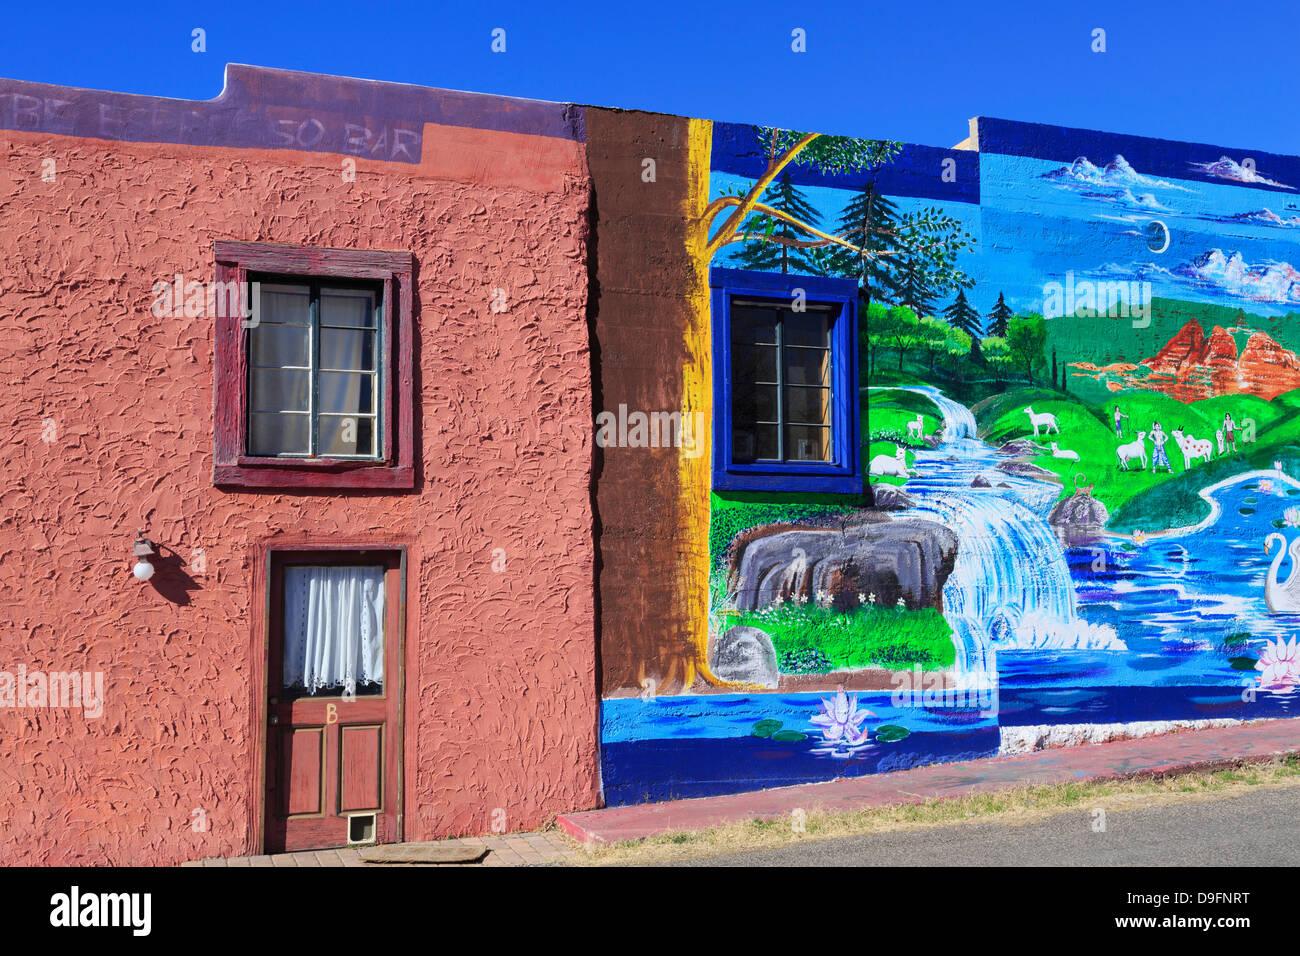 Mural in Old Town Cottonwood, Arizona, USA - Stock Image